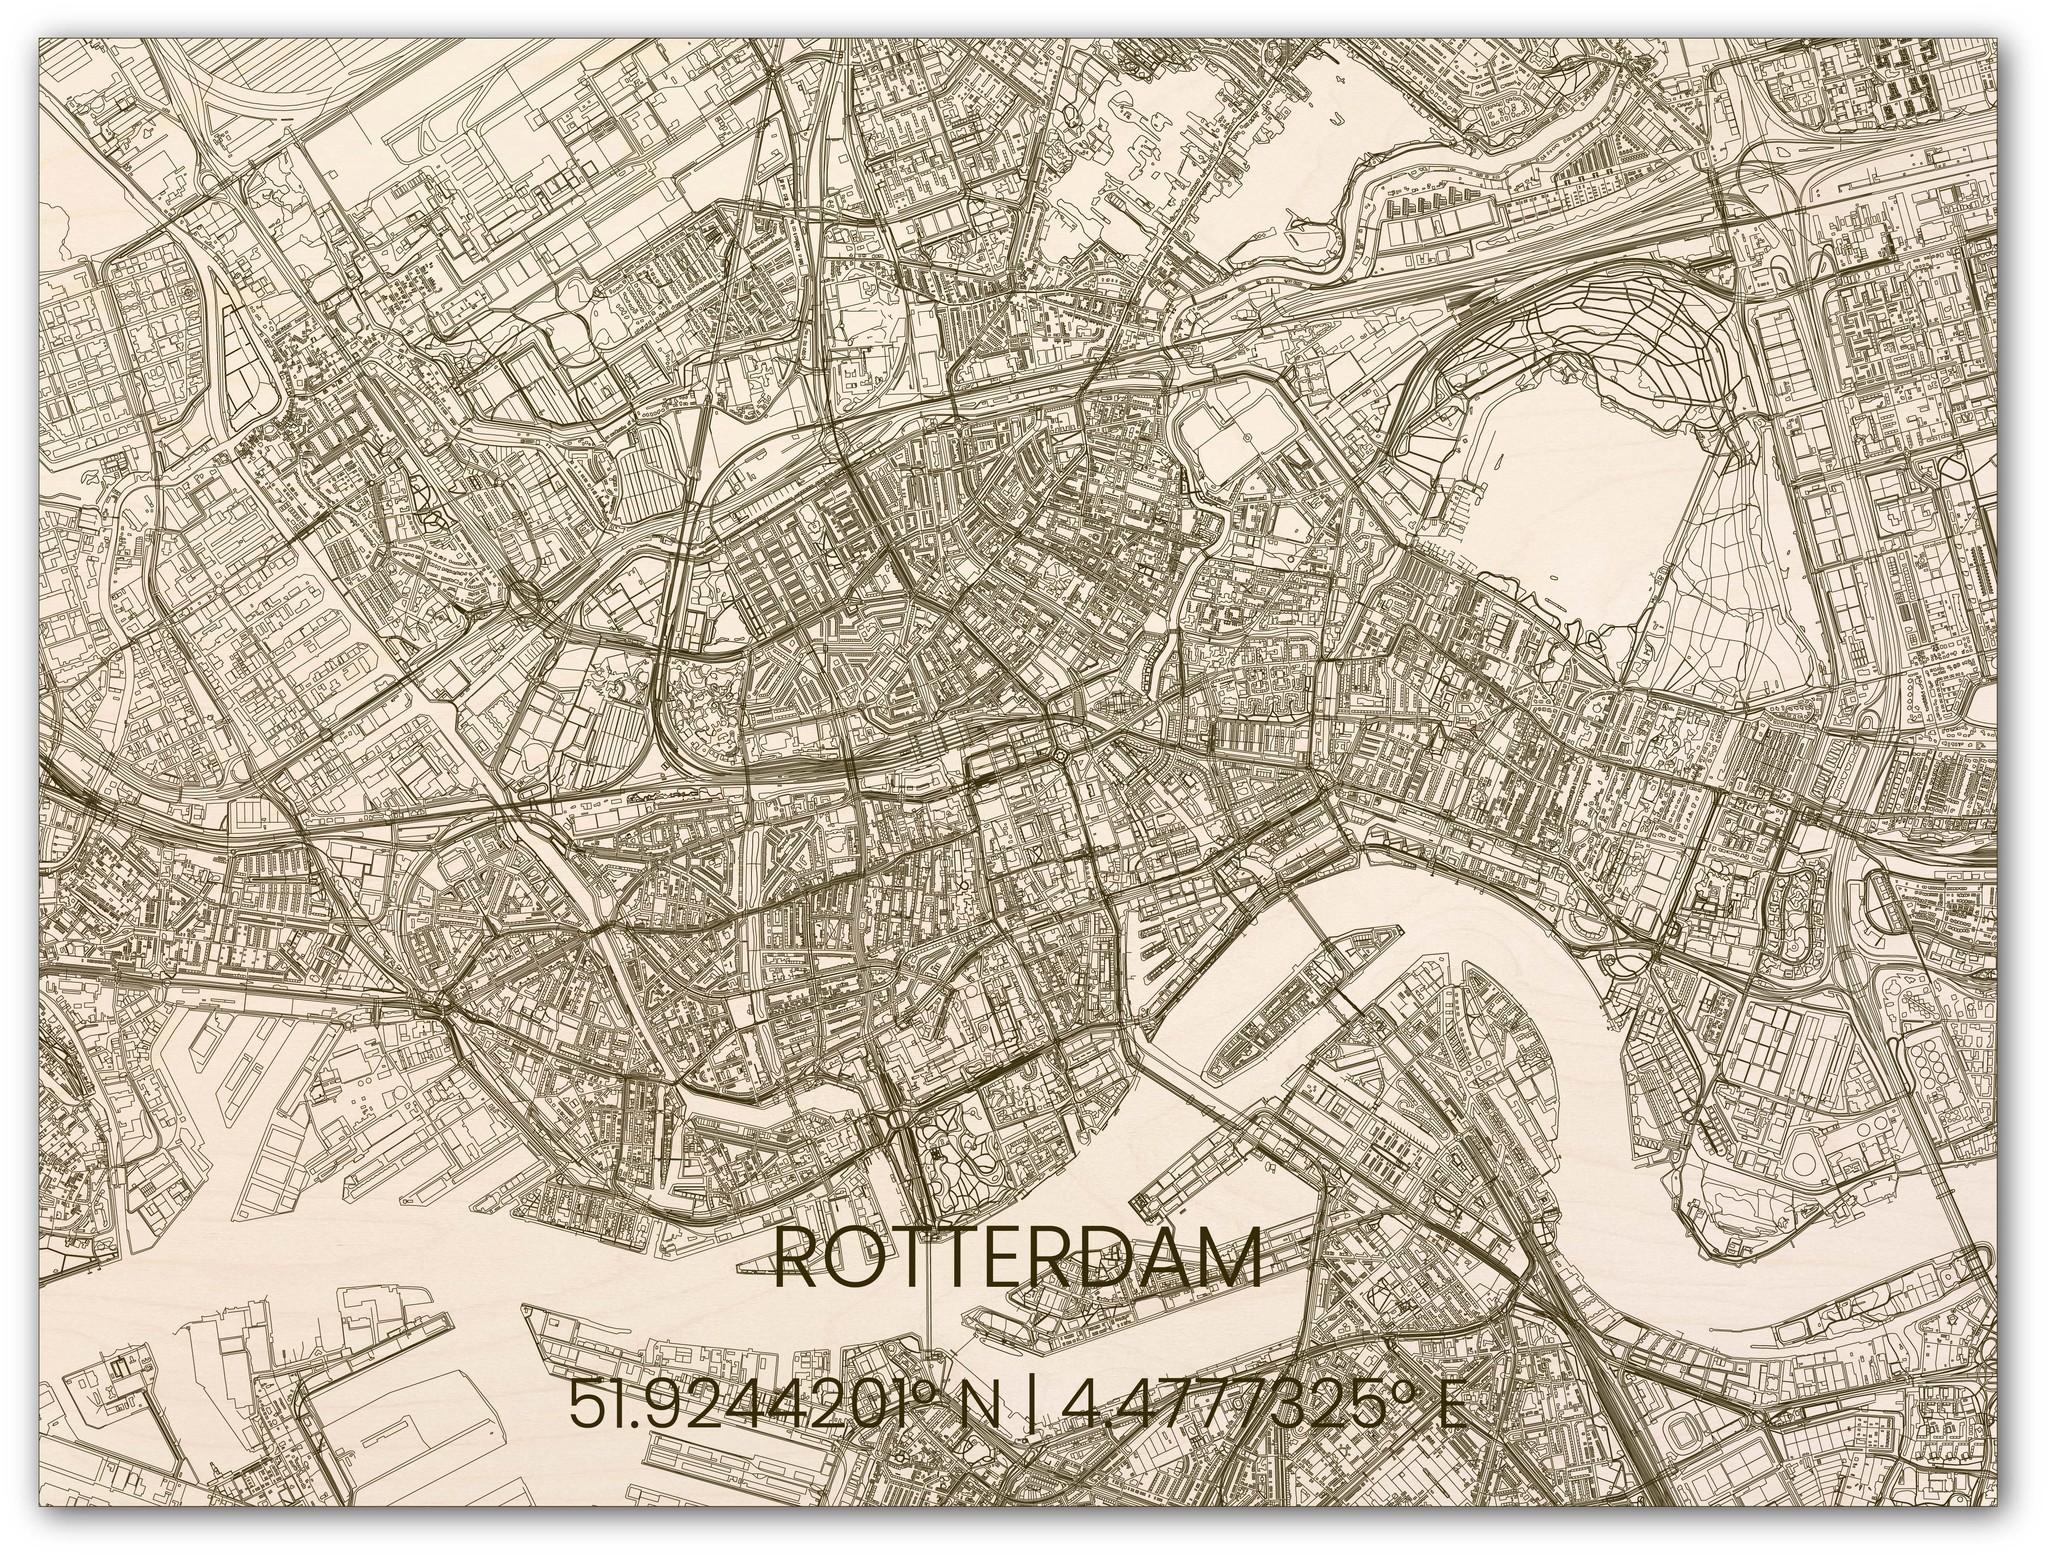 Houten stadsplattegrond Rotterdam-3